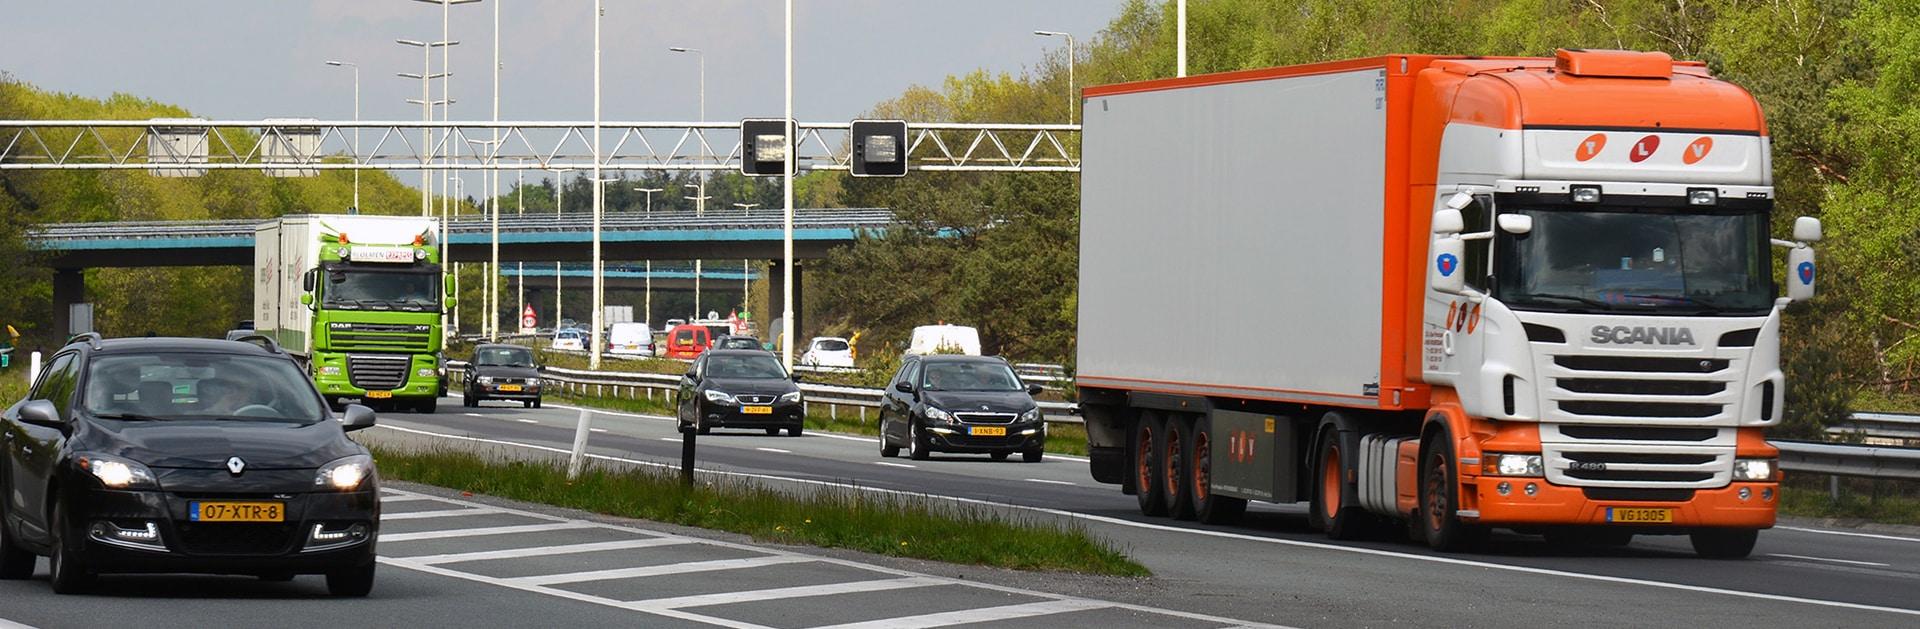 Verkeer: snelweg met autoverkeer